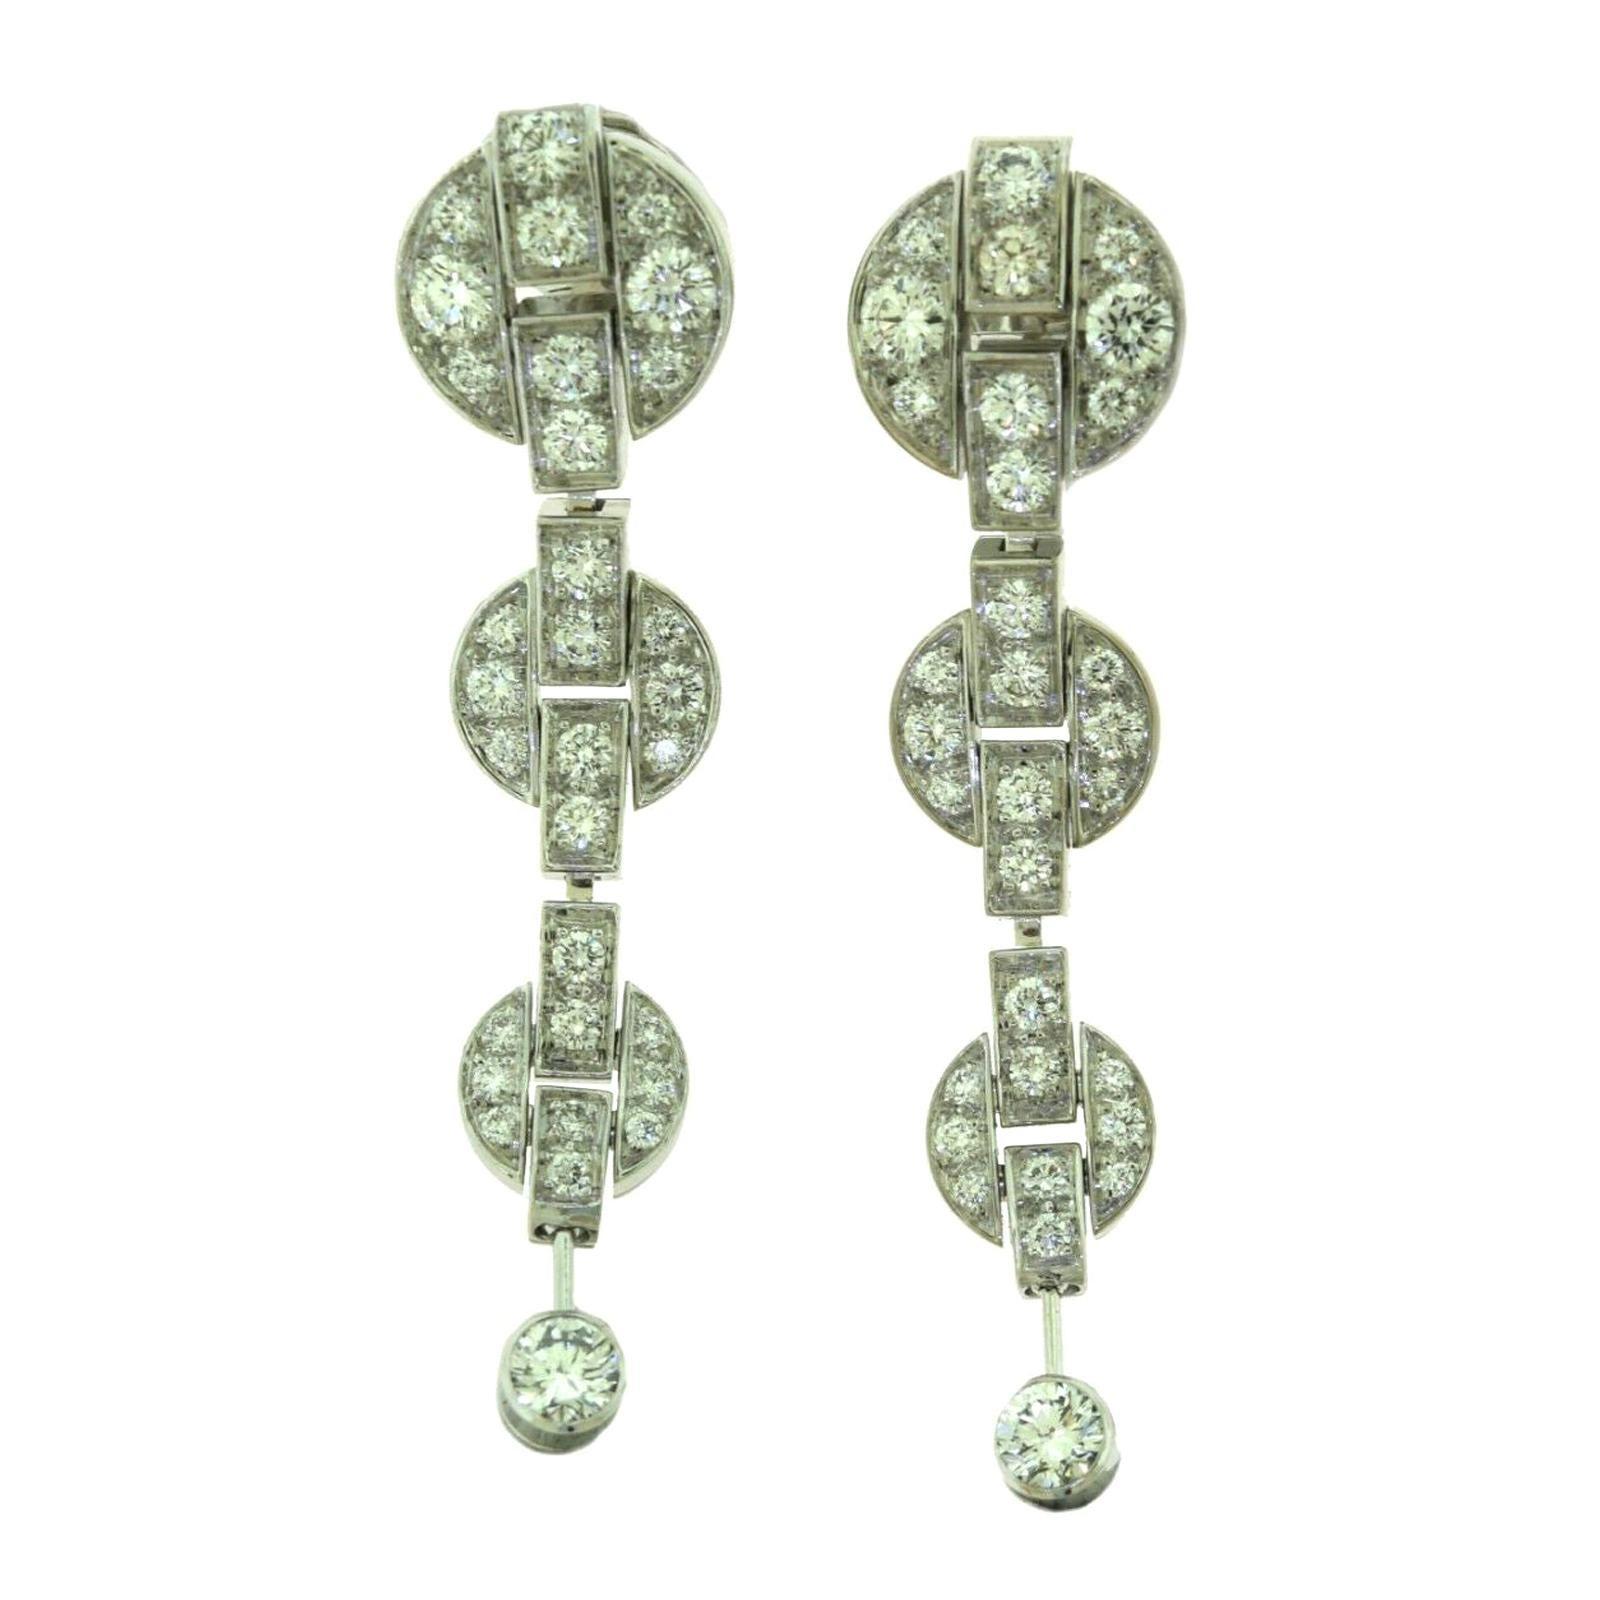 Cartier Himalia Diamond Drop Long Earrings in White Gold